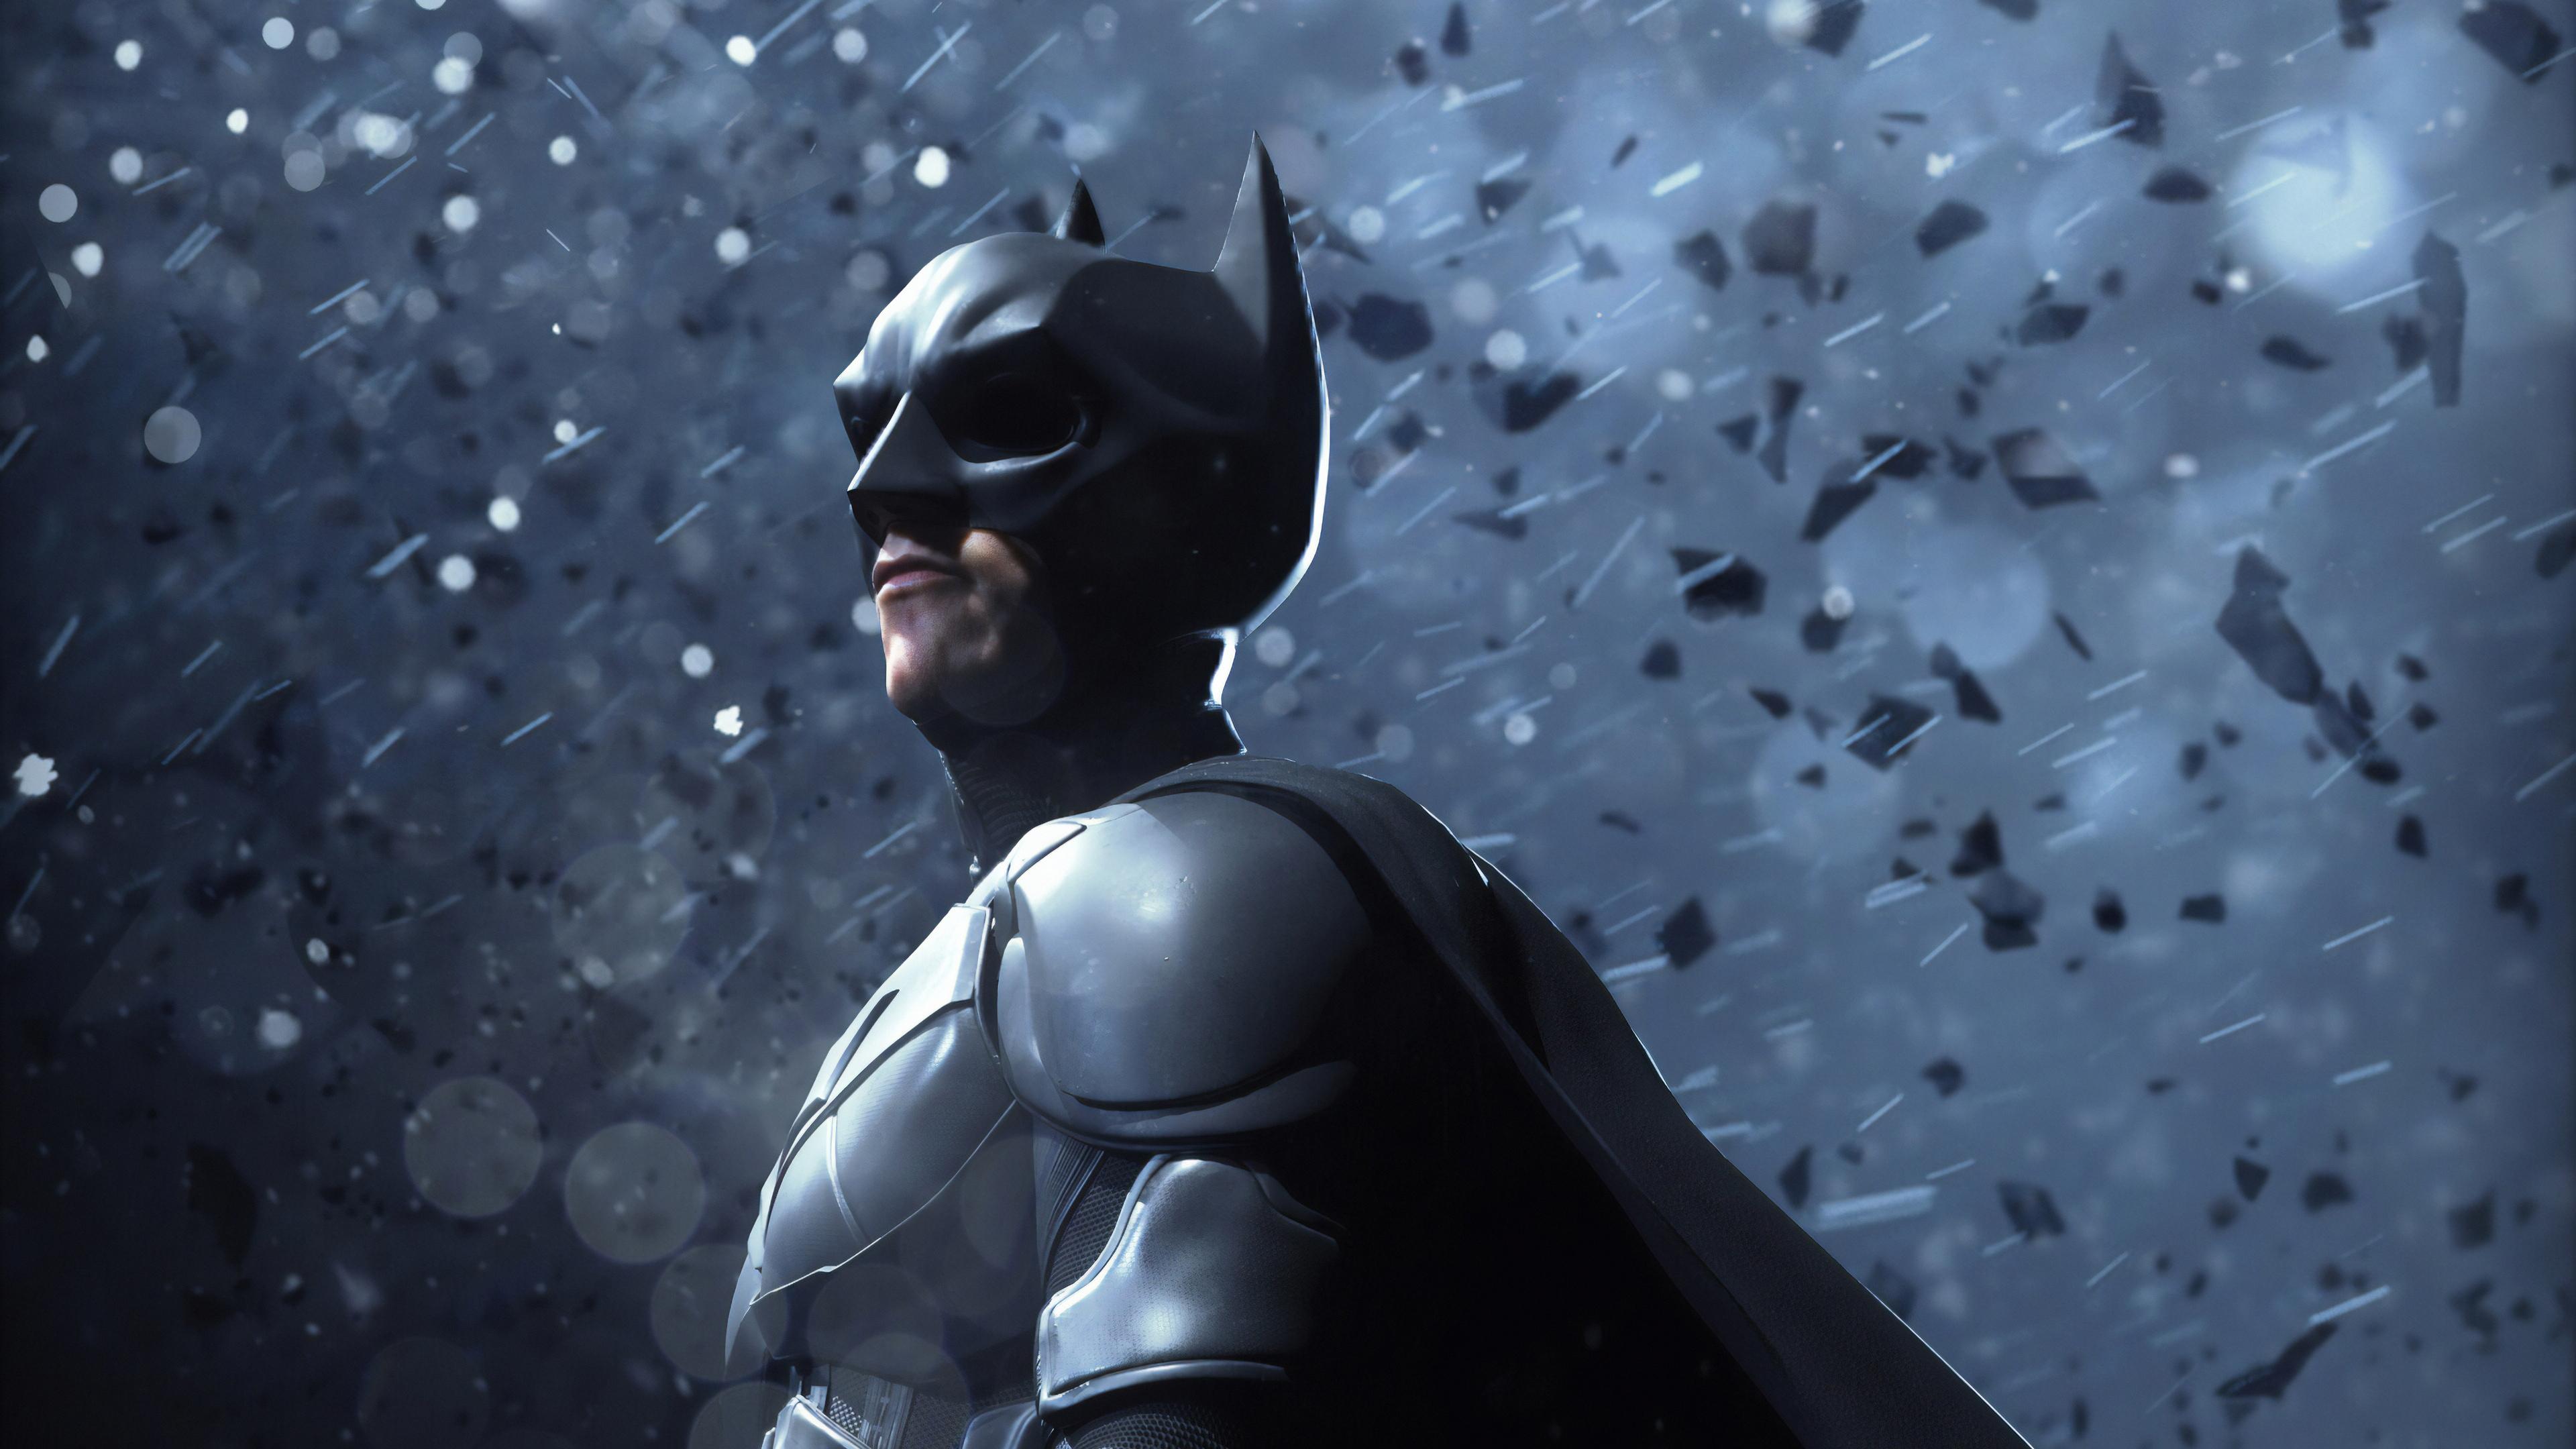 batman the dark knight 1565053046 - Batman The Dark Knight - superheroes wallpapers, hd-wallpapers, digital art wallpapers, batman wallpapers, artwork wallpapers, artstation wallpapers, 4k-wallpapers